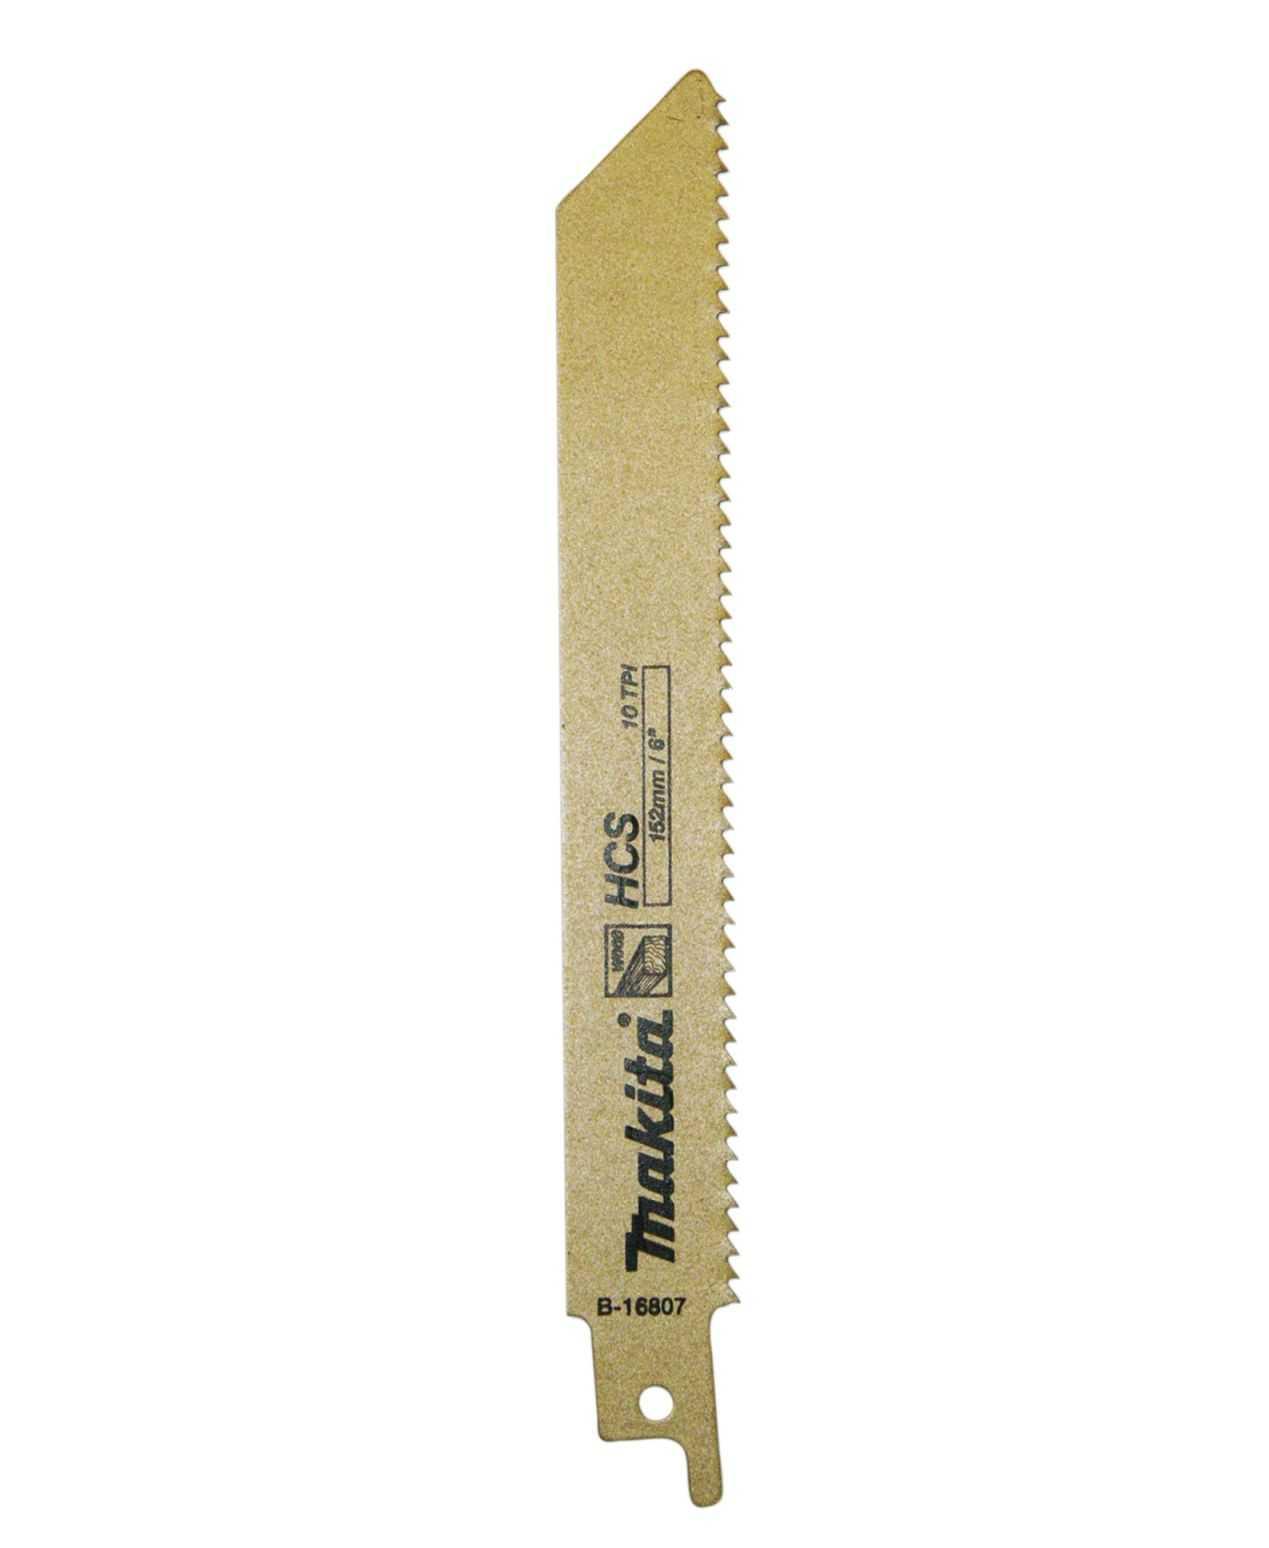 Alquiler sierra de sable gomez oviedo rentalstore - Hojas de sierra para madera ...